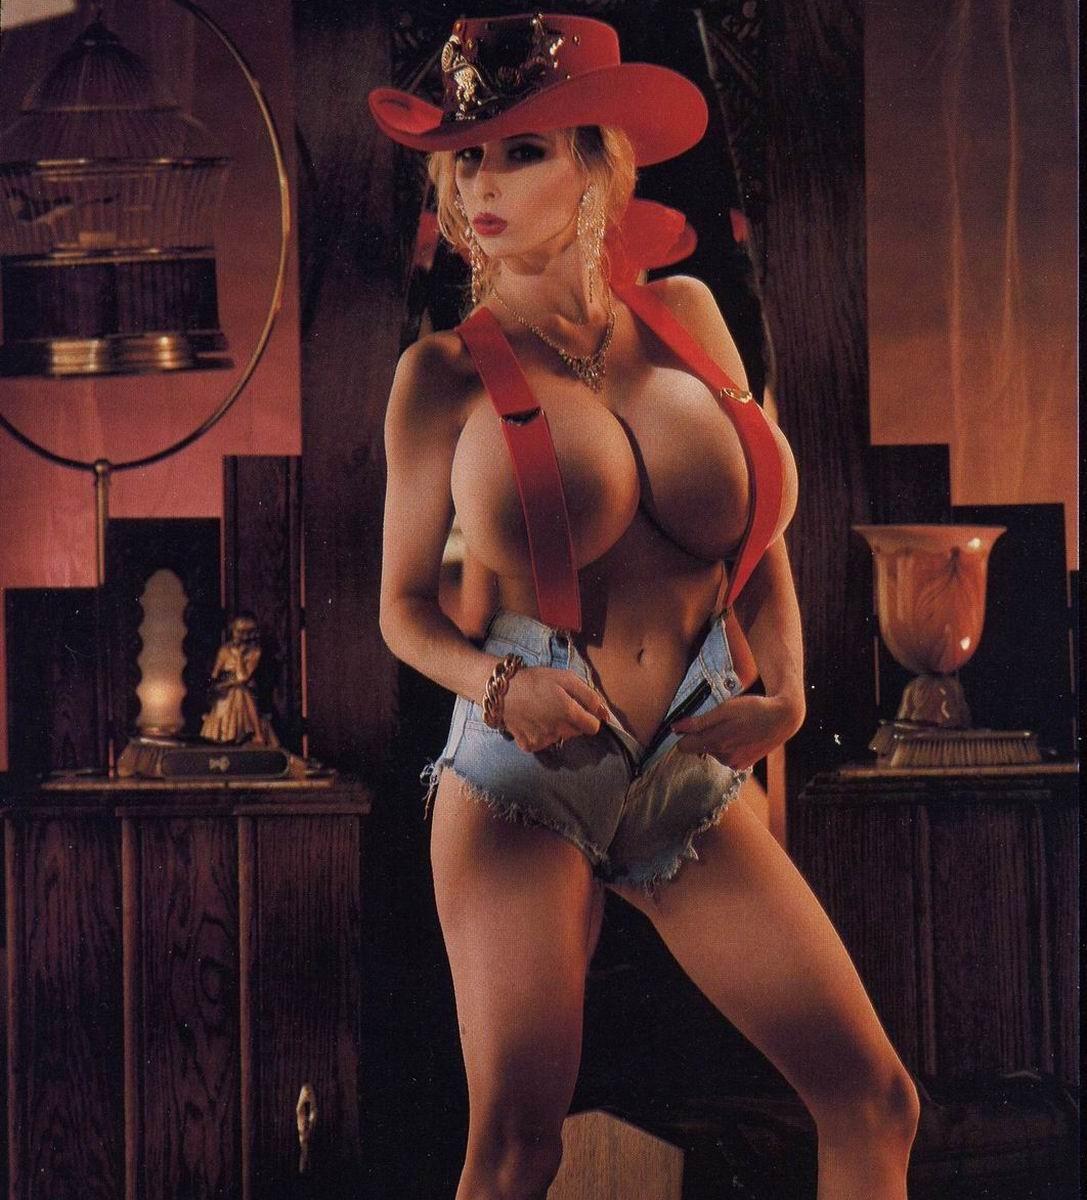 Colin ferrell alexander naked pics